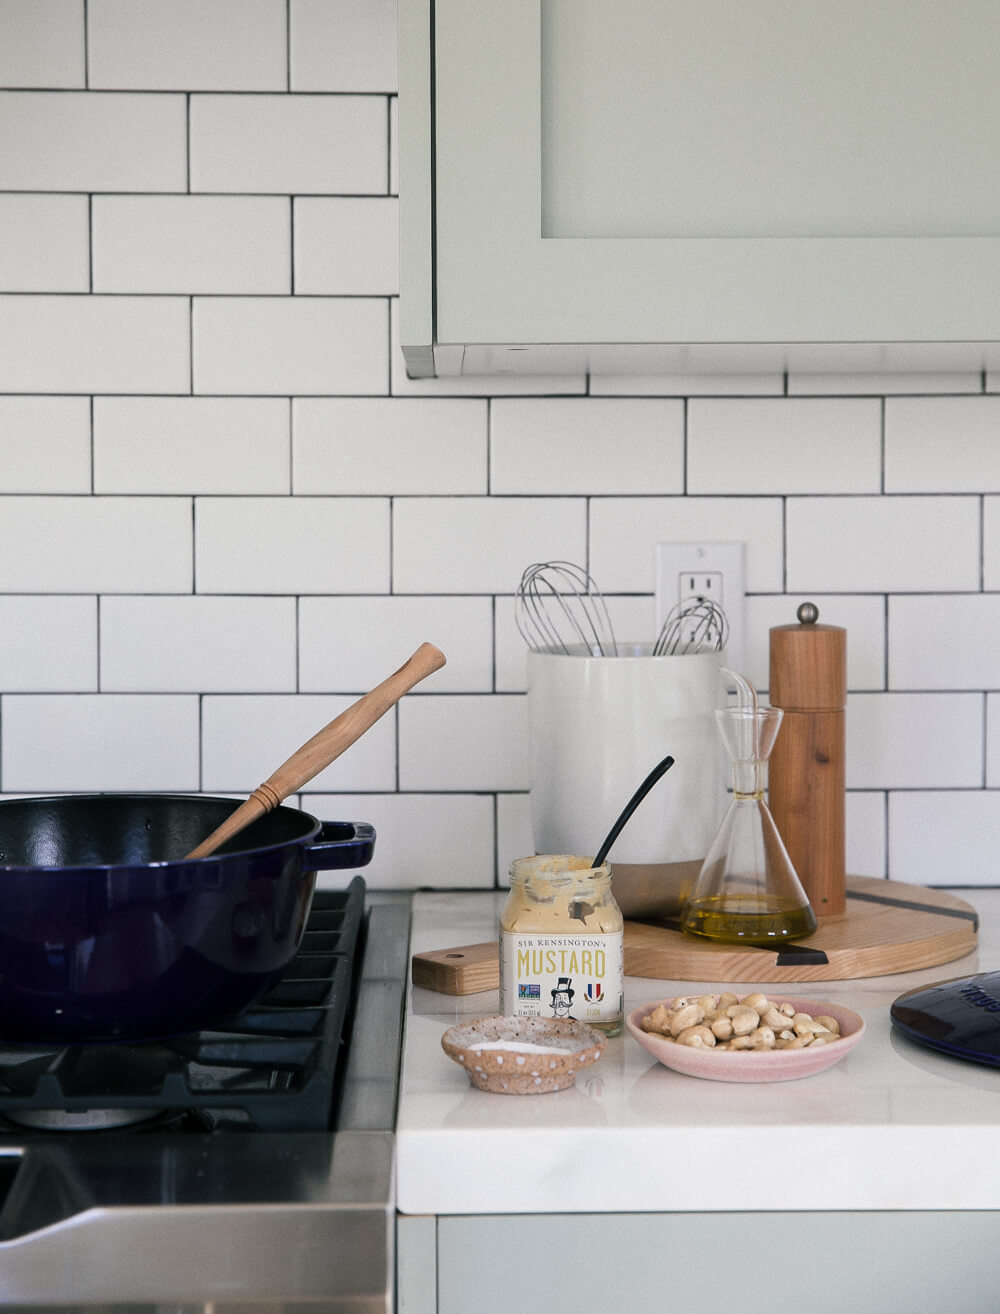 Creamy Vegan Kale and Mushroom Macaroni and Cheese – A Cozy Kitchen